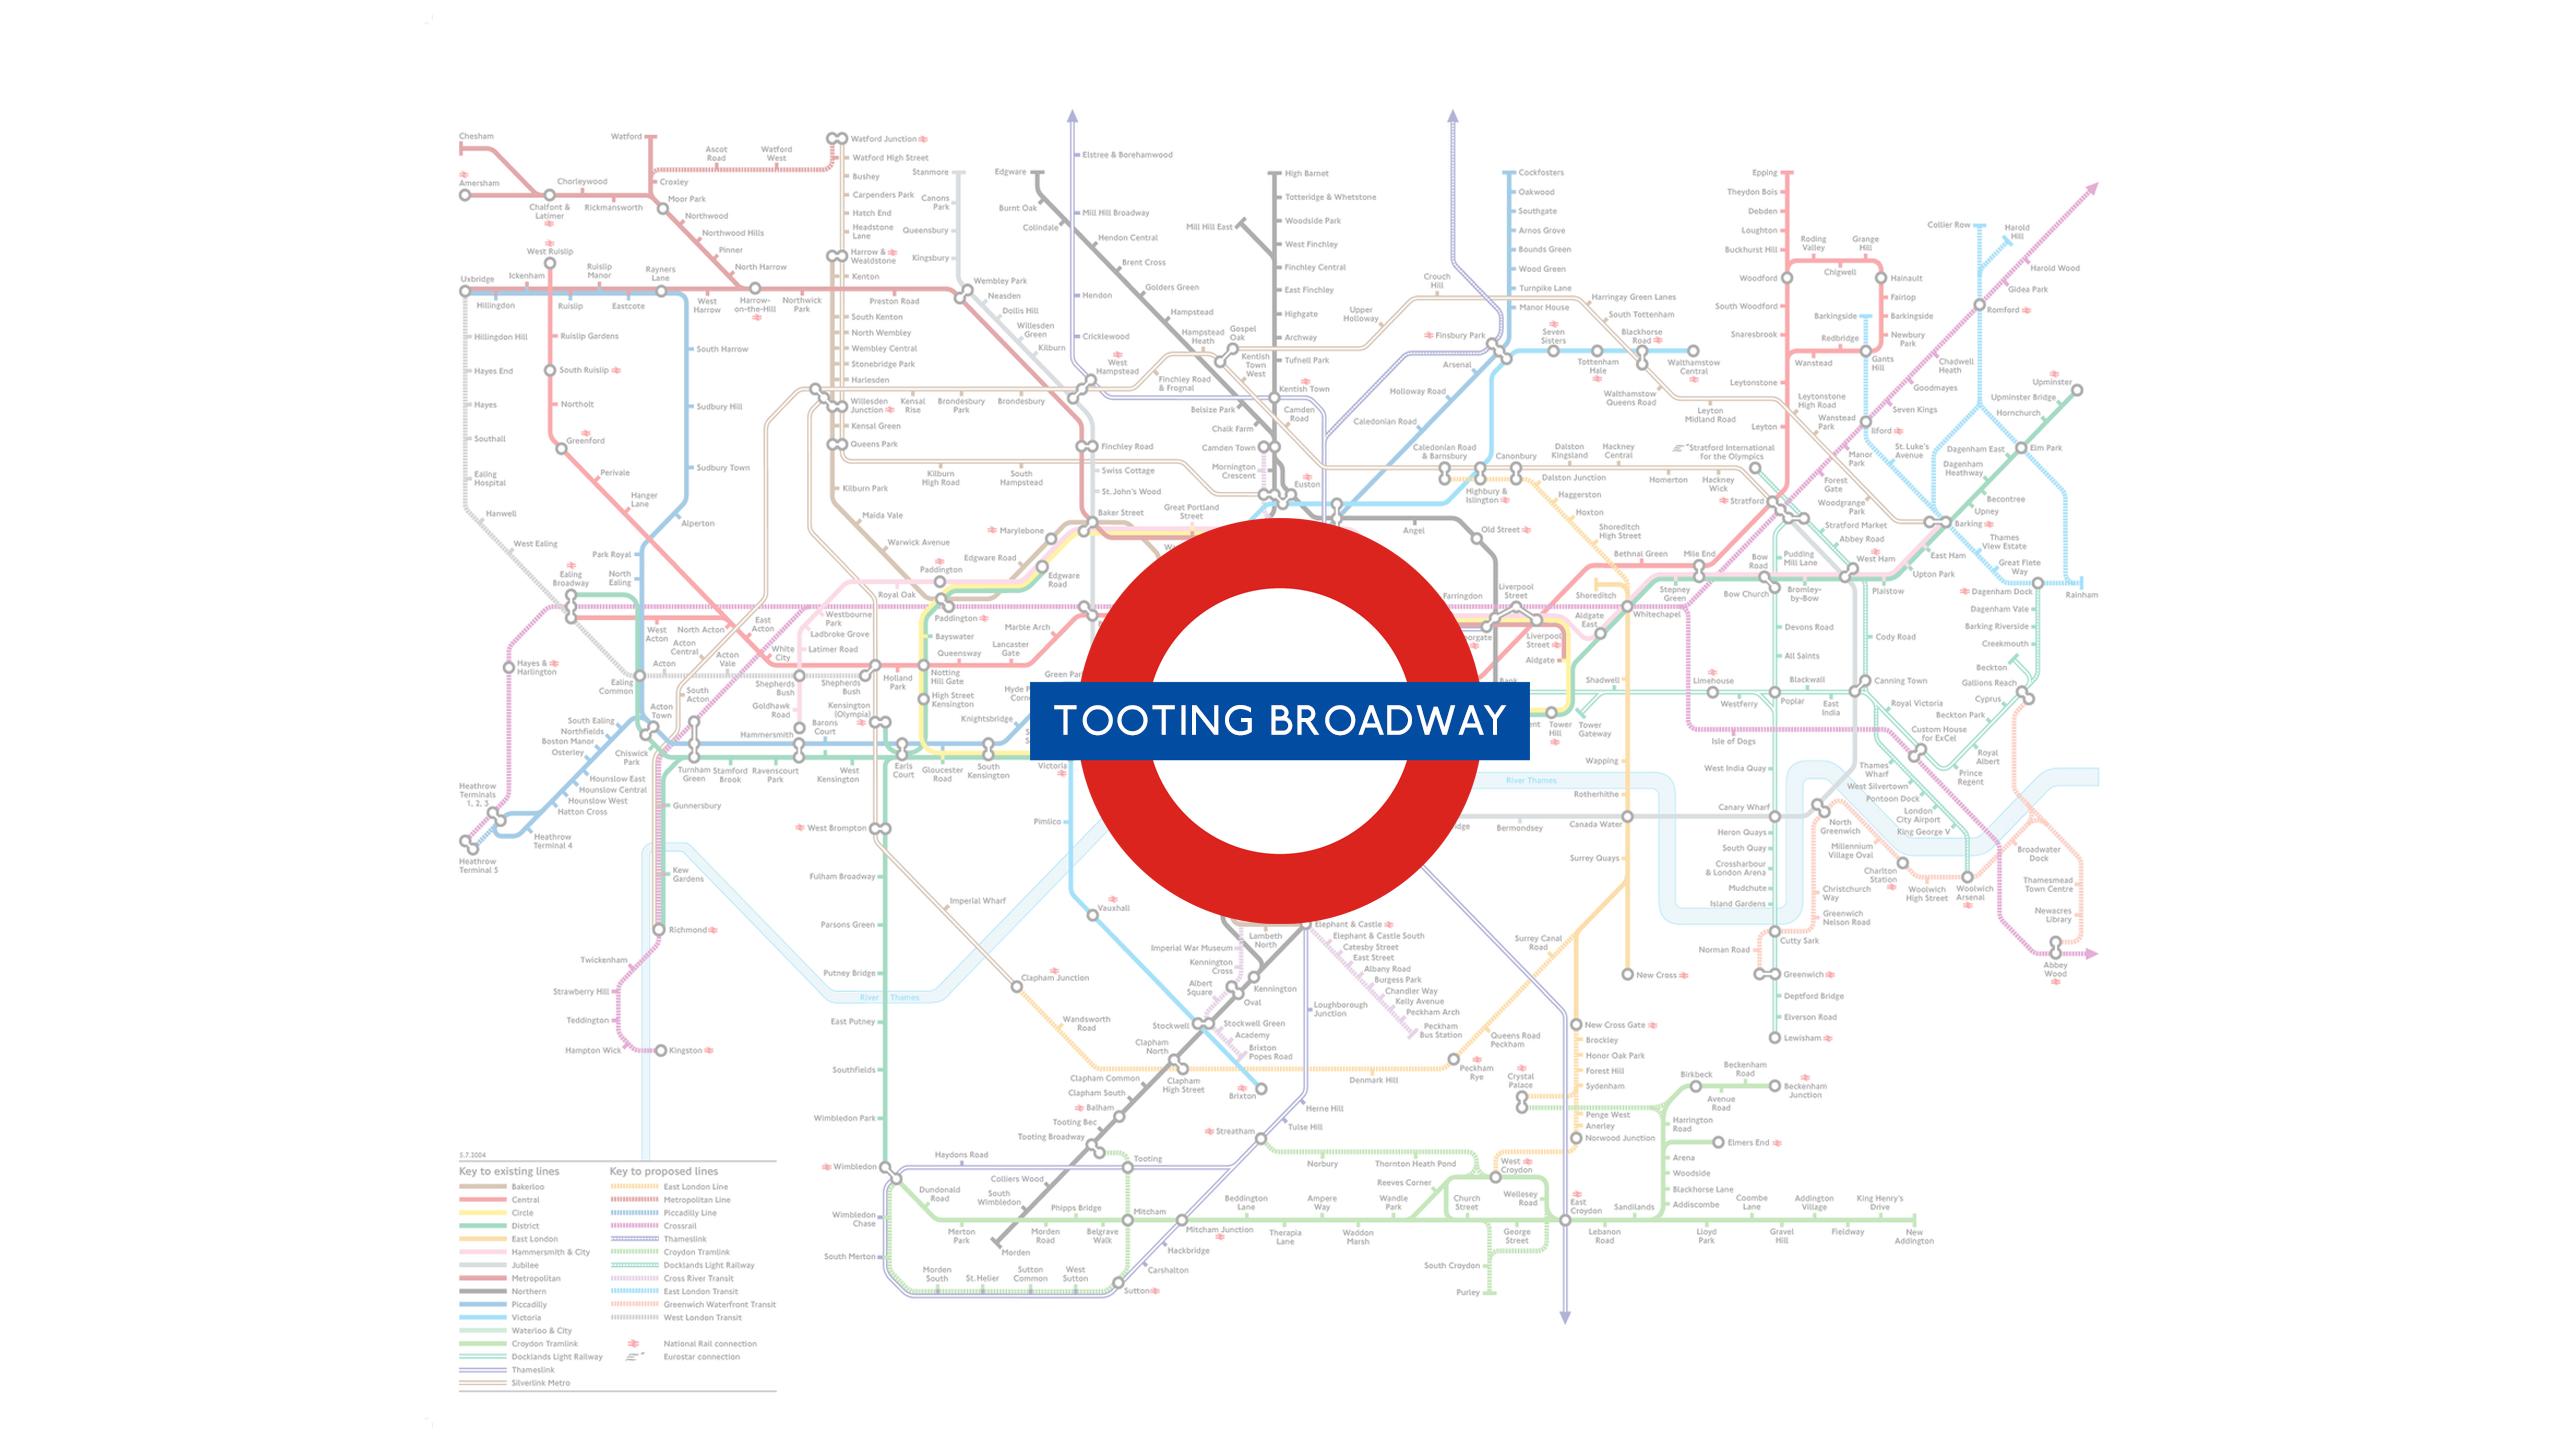 Tooting Broadway (Map)